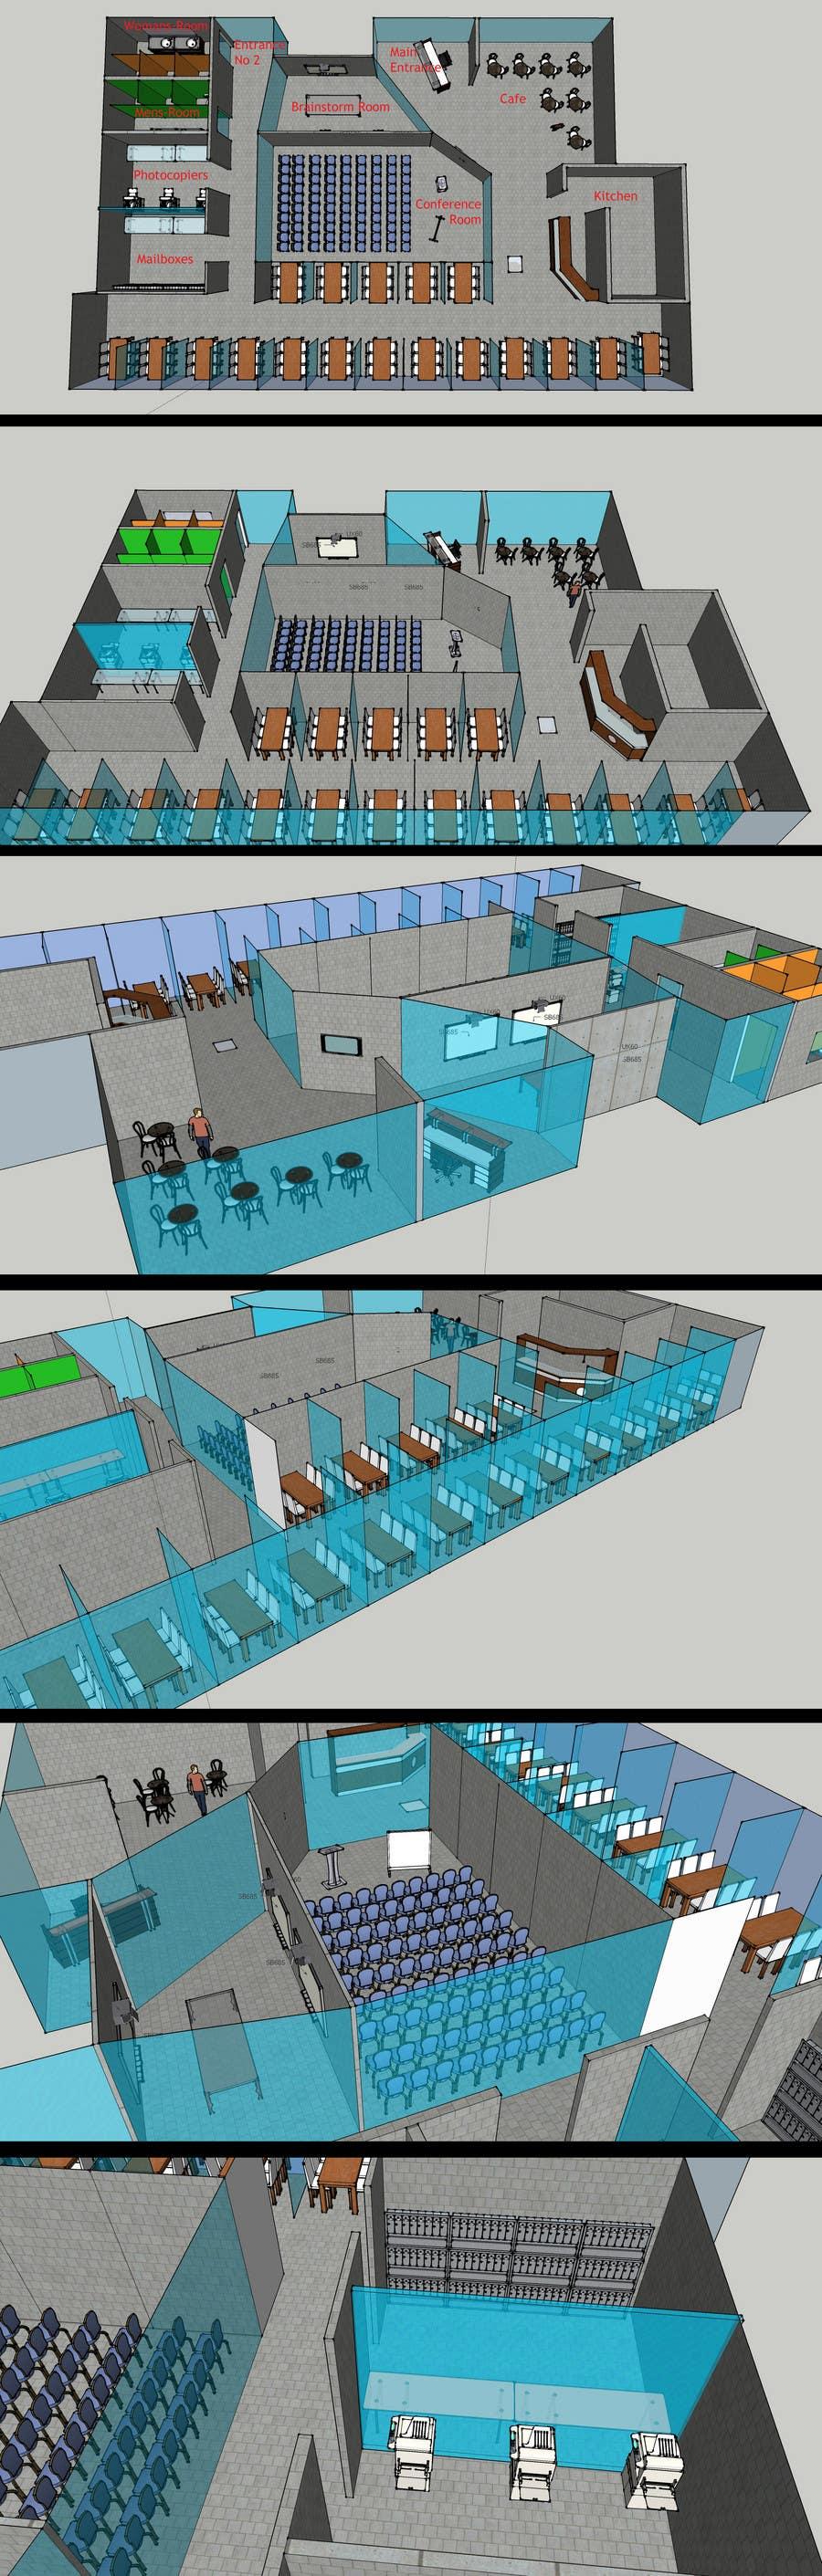 Penyertaan Peraduan #13 untuk Architectural Floorplan Layout for PolarPointe Business Cafe